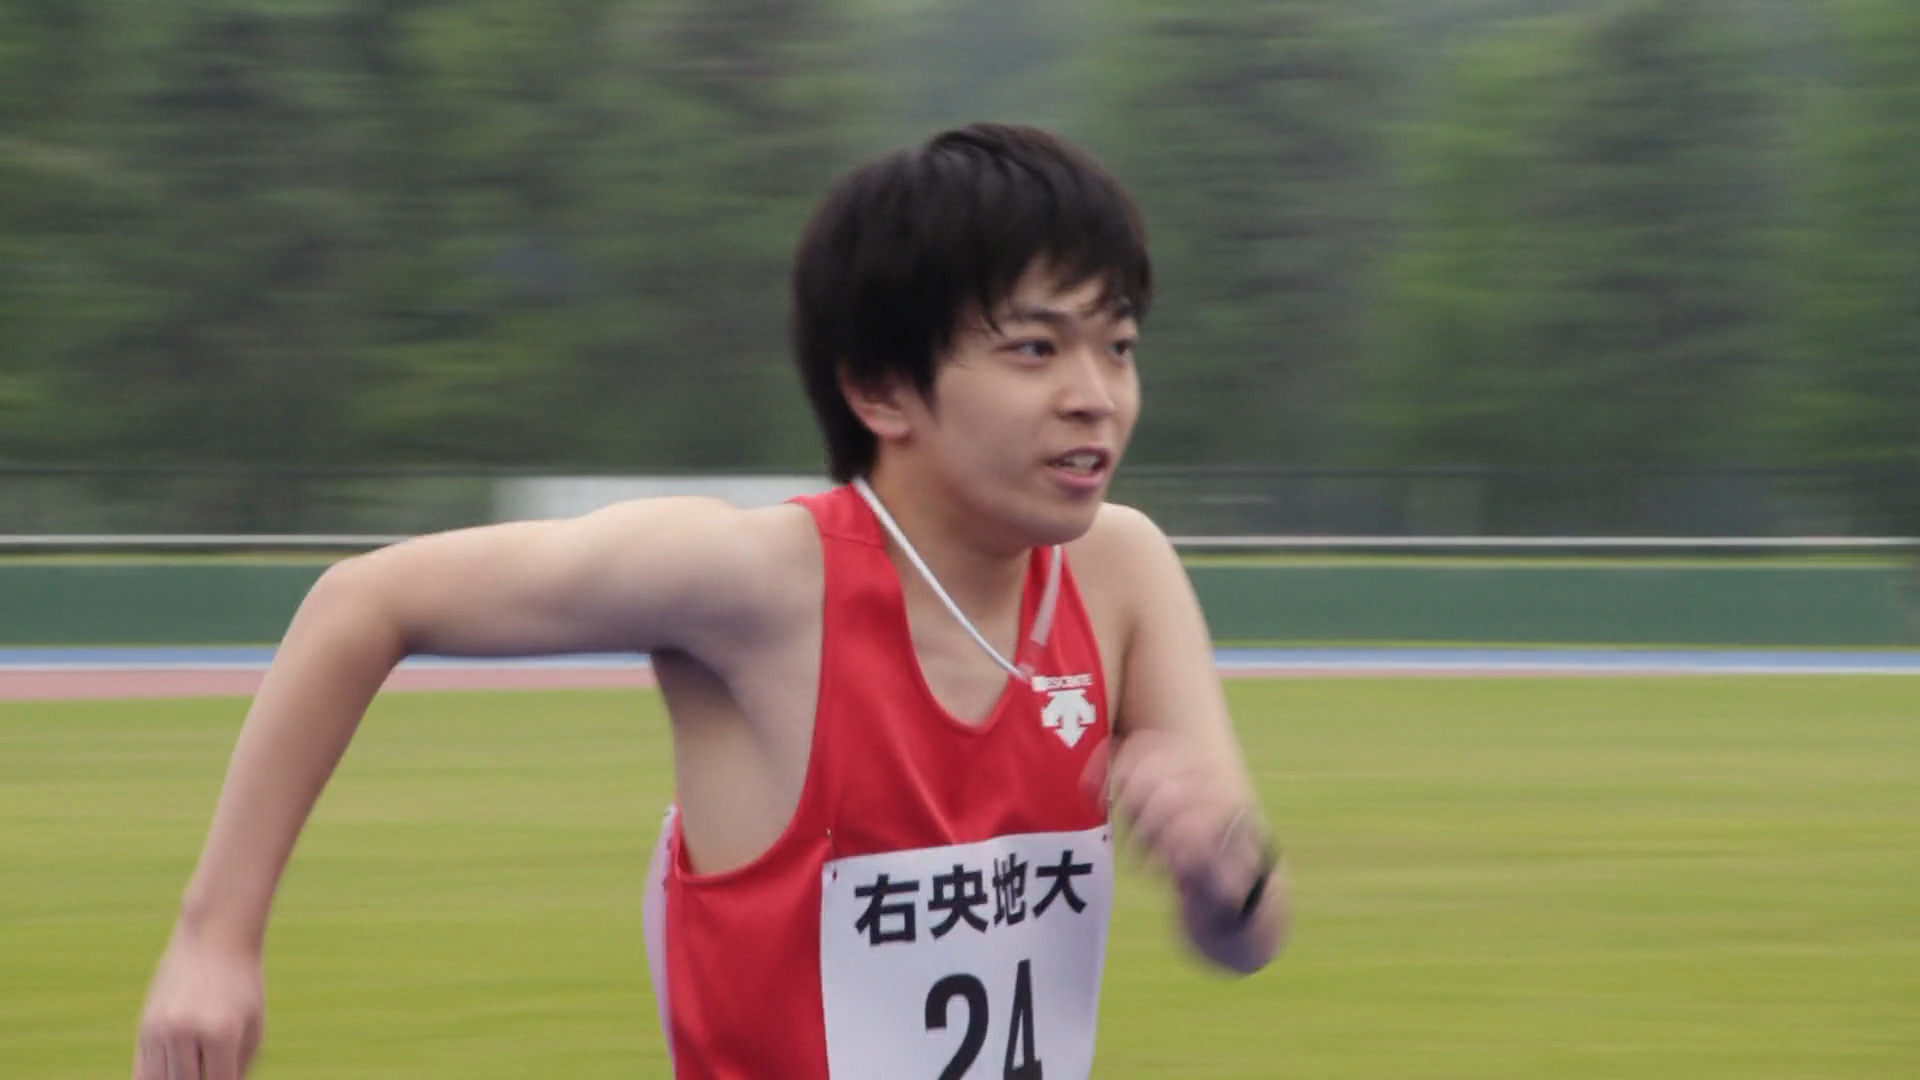 Kazuma Nishimura